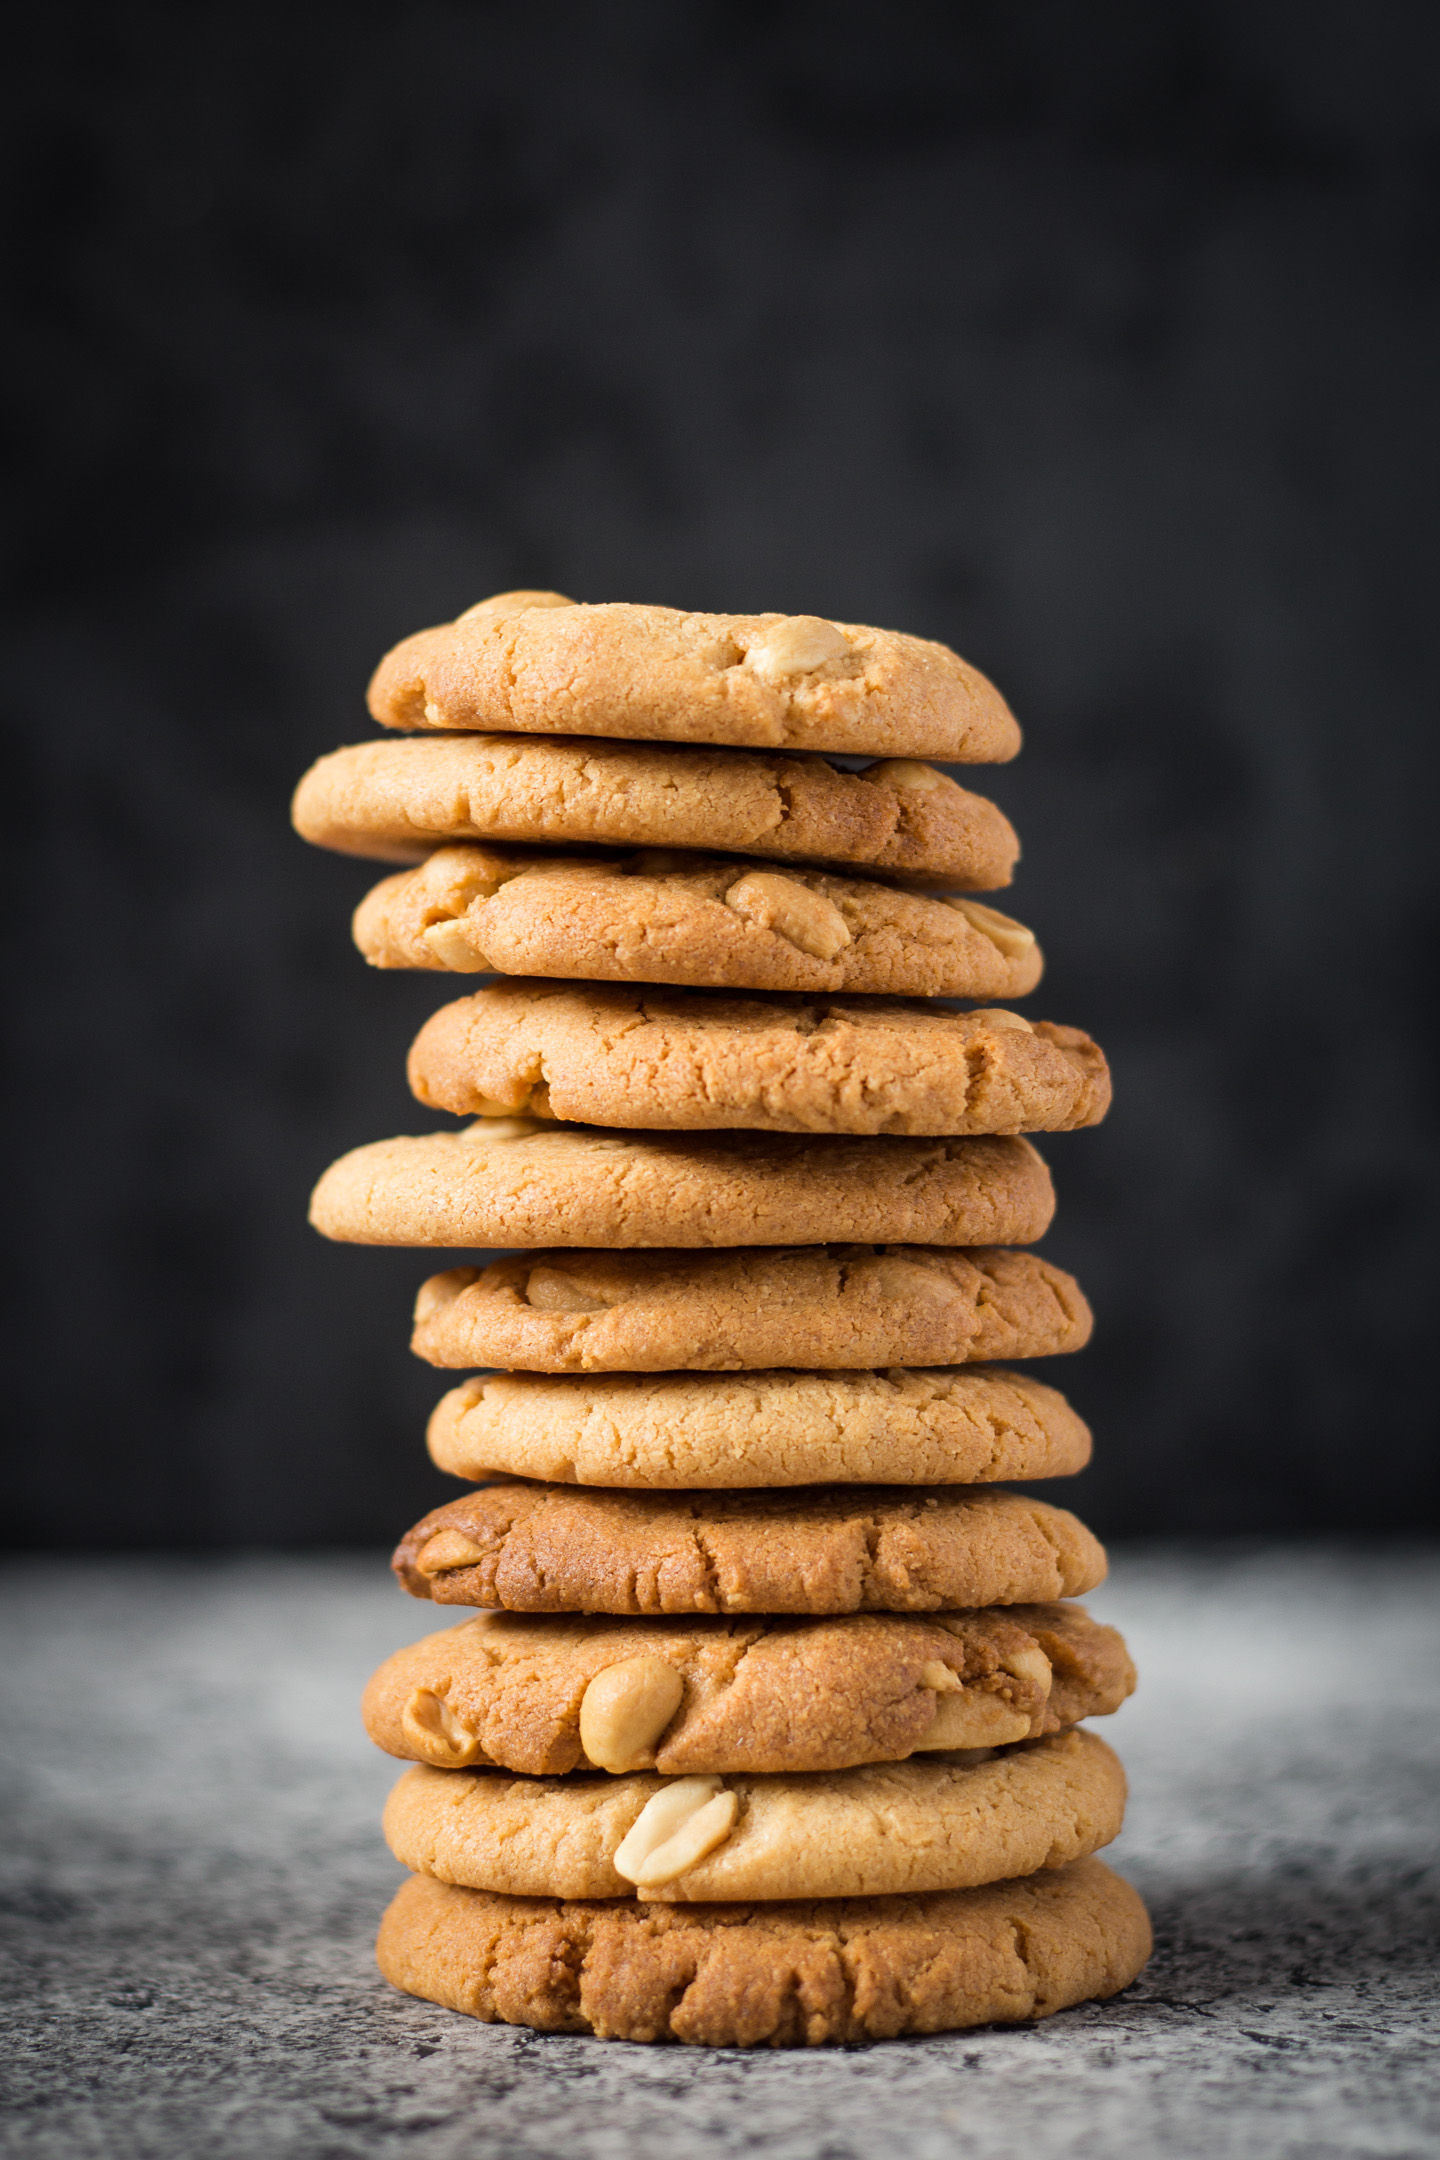 salted-peanut-butter-cookie-gluten-free-recipe